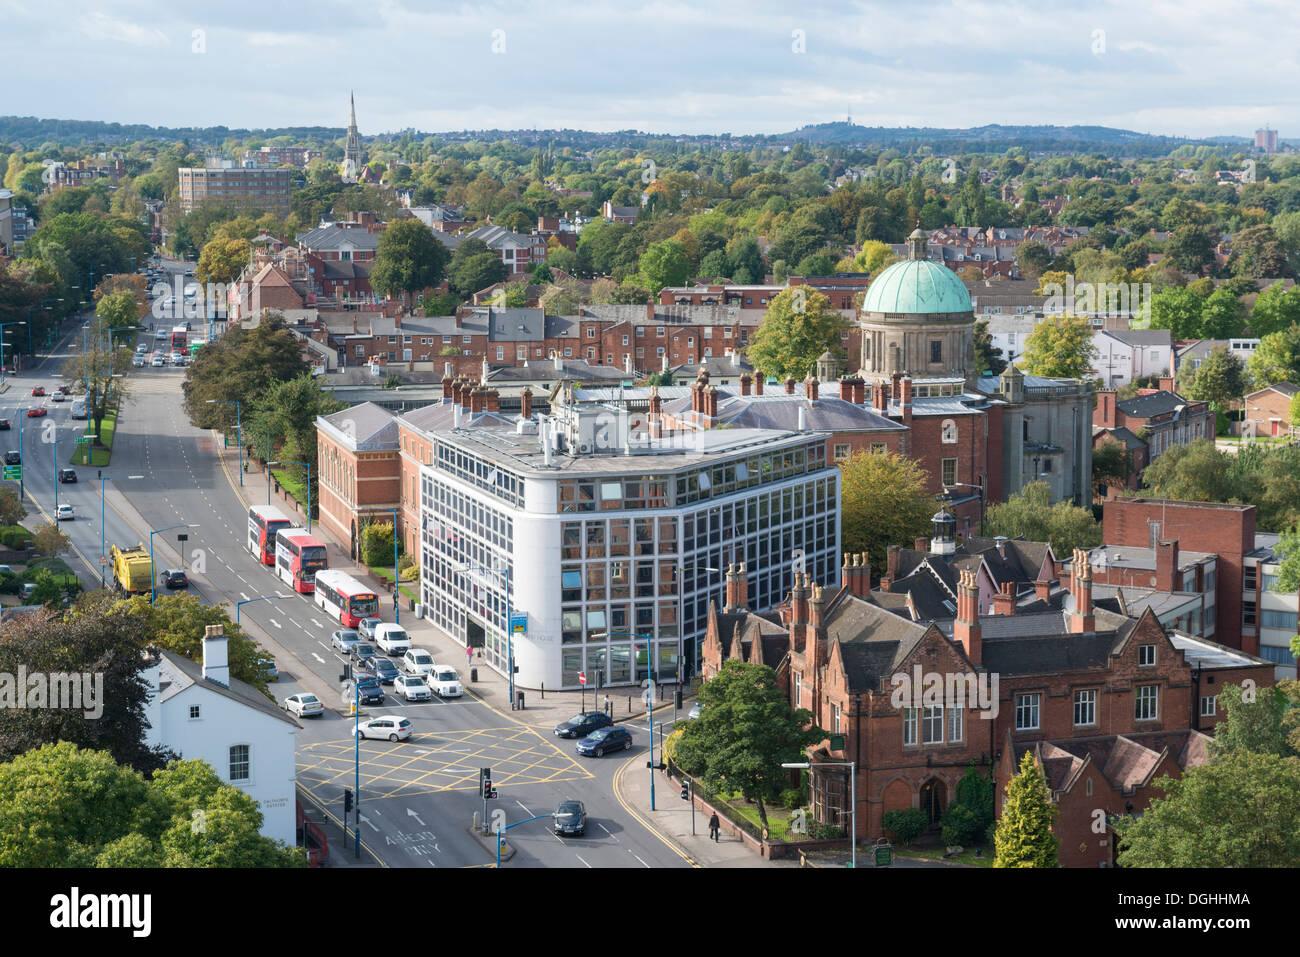 Die Hagley Road, Edgbaston, Birmingham, England Stockbild